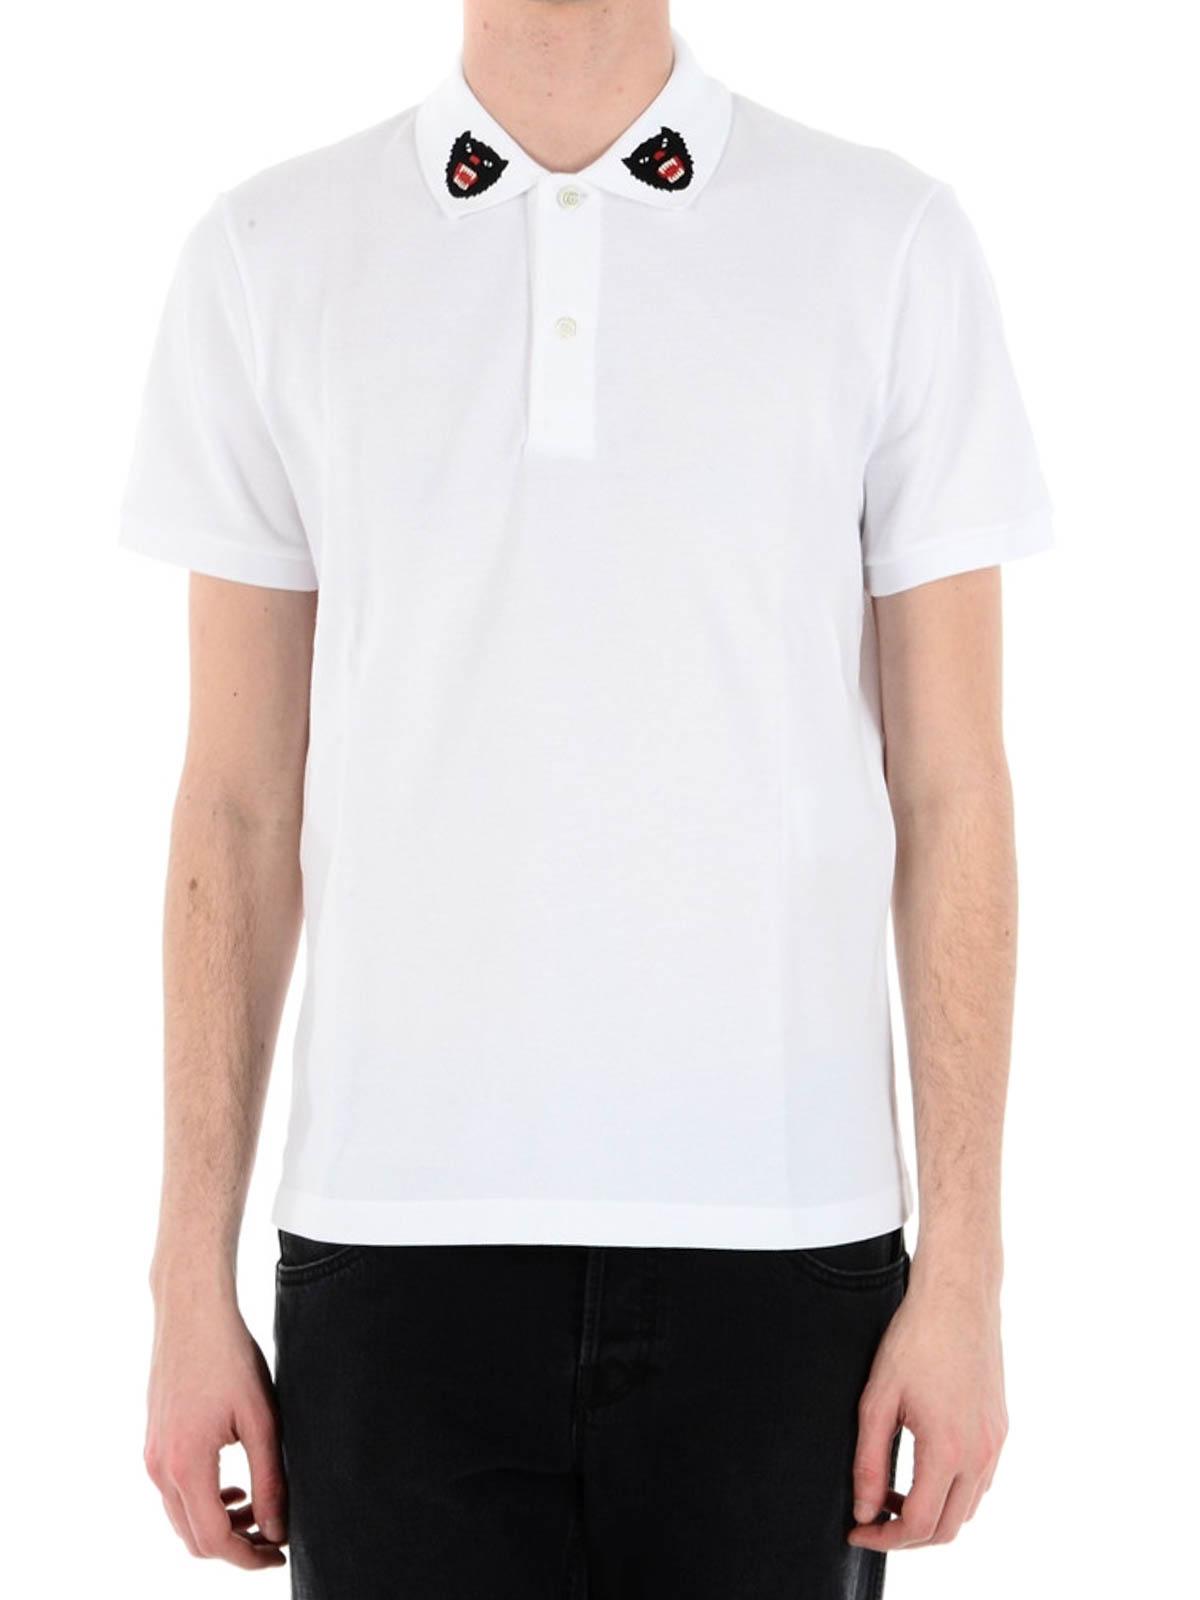 8312895cd9045a Gucci - Tiger logo on collar polo shirt - polo shirts - 453865X5H769024